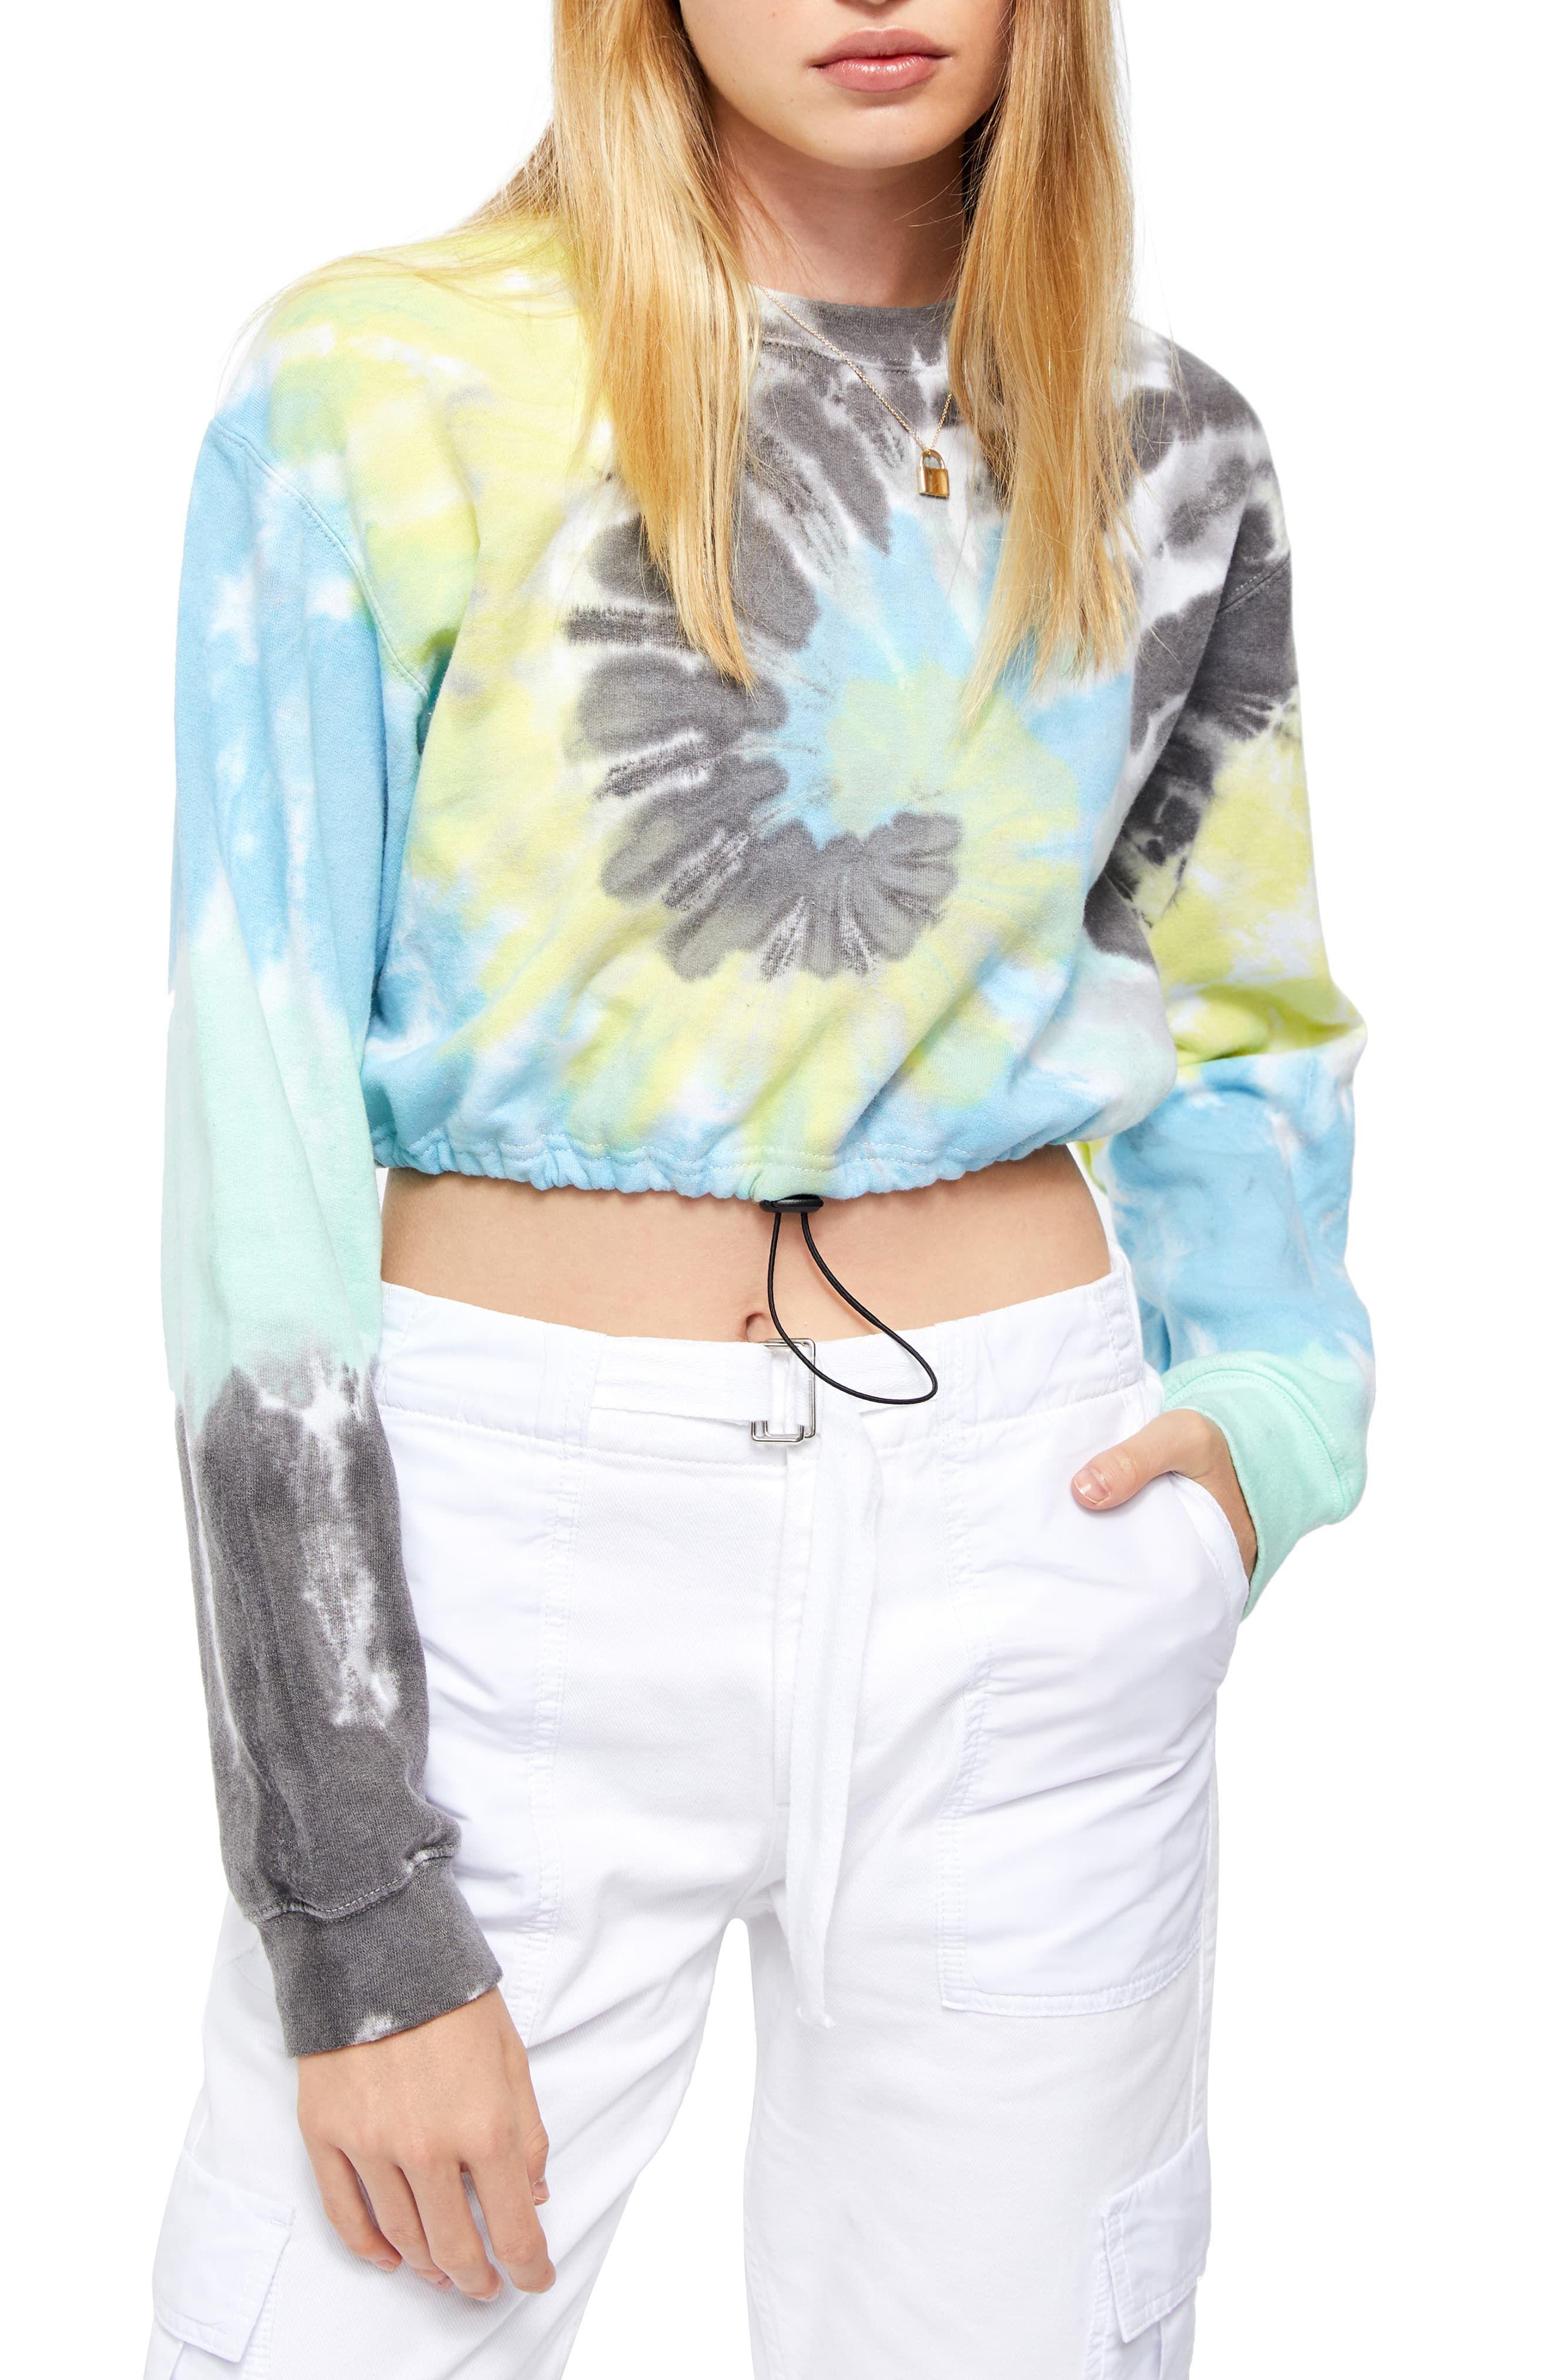 Bdg Urban Outfitters Tie Dye Crop Sweatshirt Nordstrom In 2020 Tie Dye Shirts Patterns Crop Sweatshirt Fashion Clothes Women [ 4048 x 2640 Pixel ]